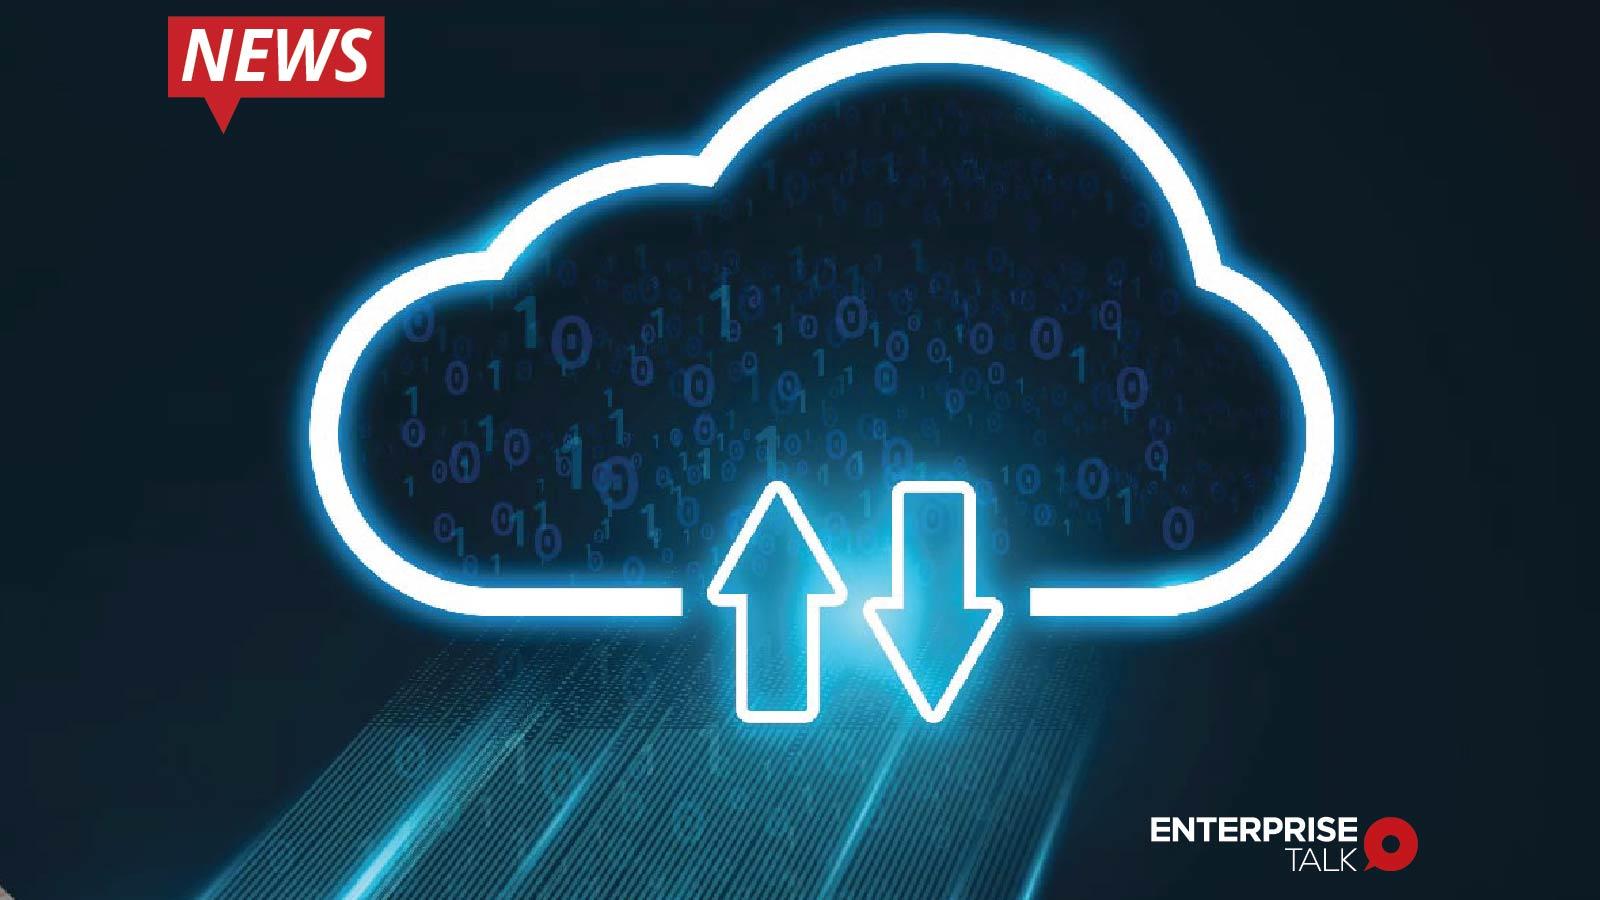 Digital Okta and RackNap Join Forces to Boost Cloud Adoption in MENA Region